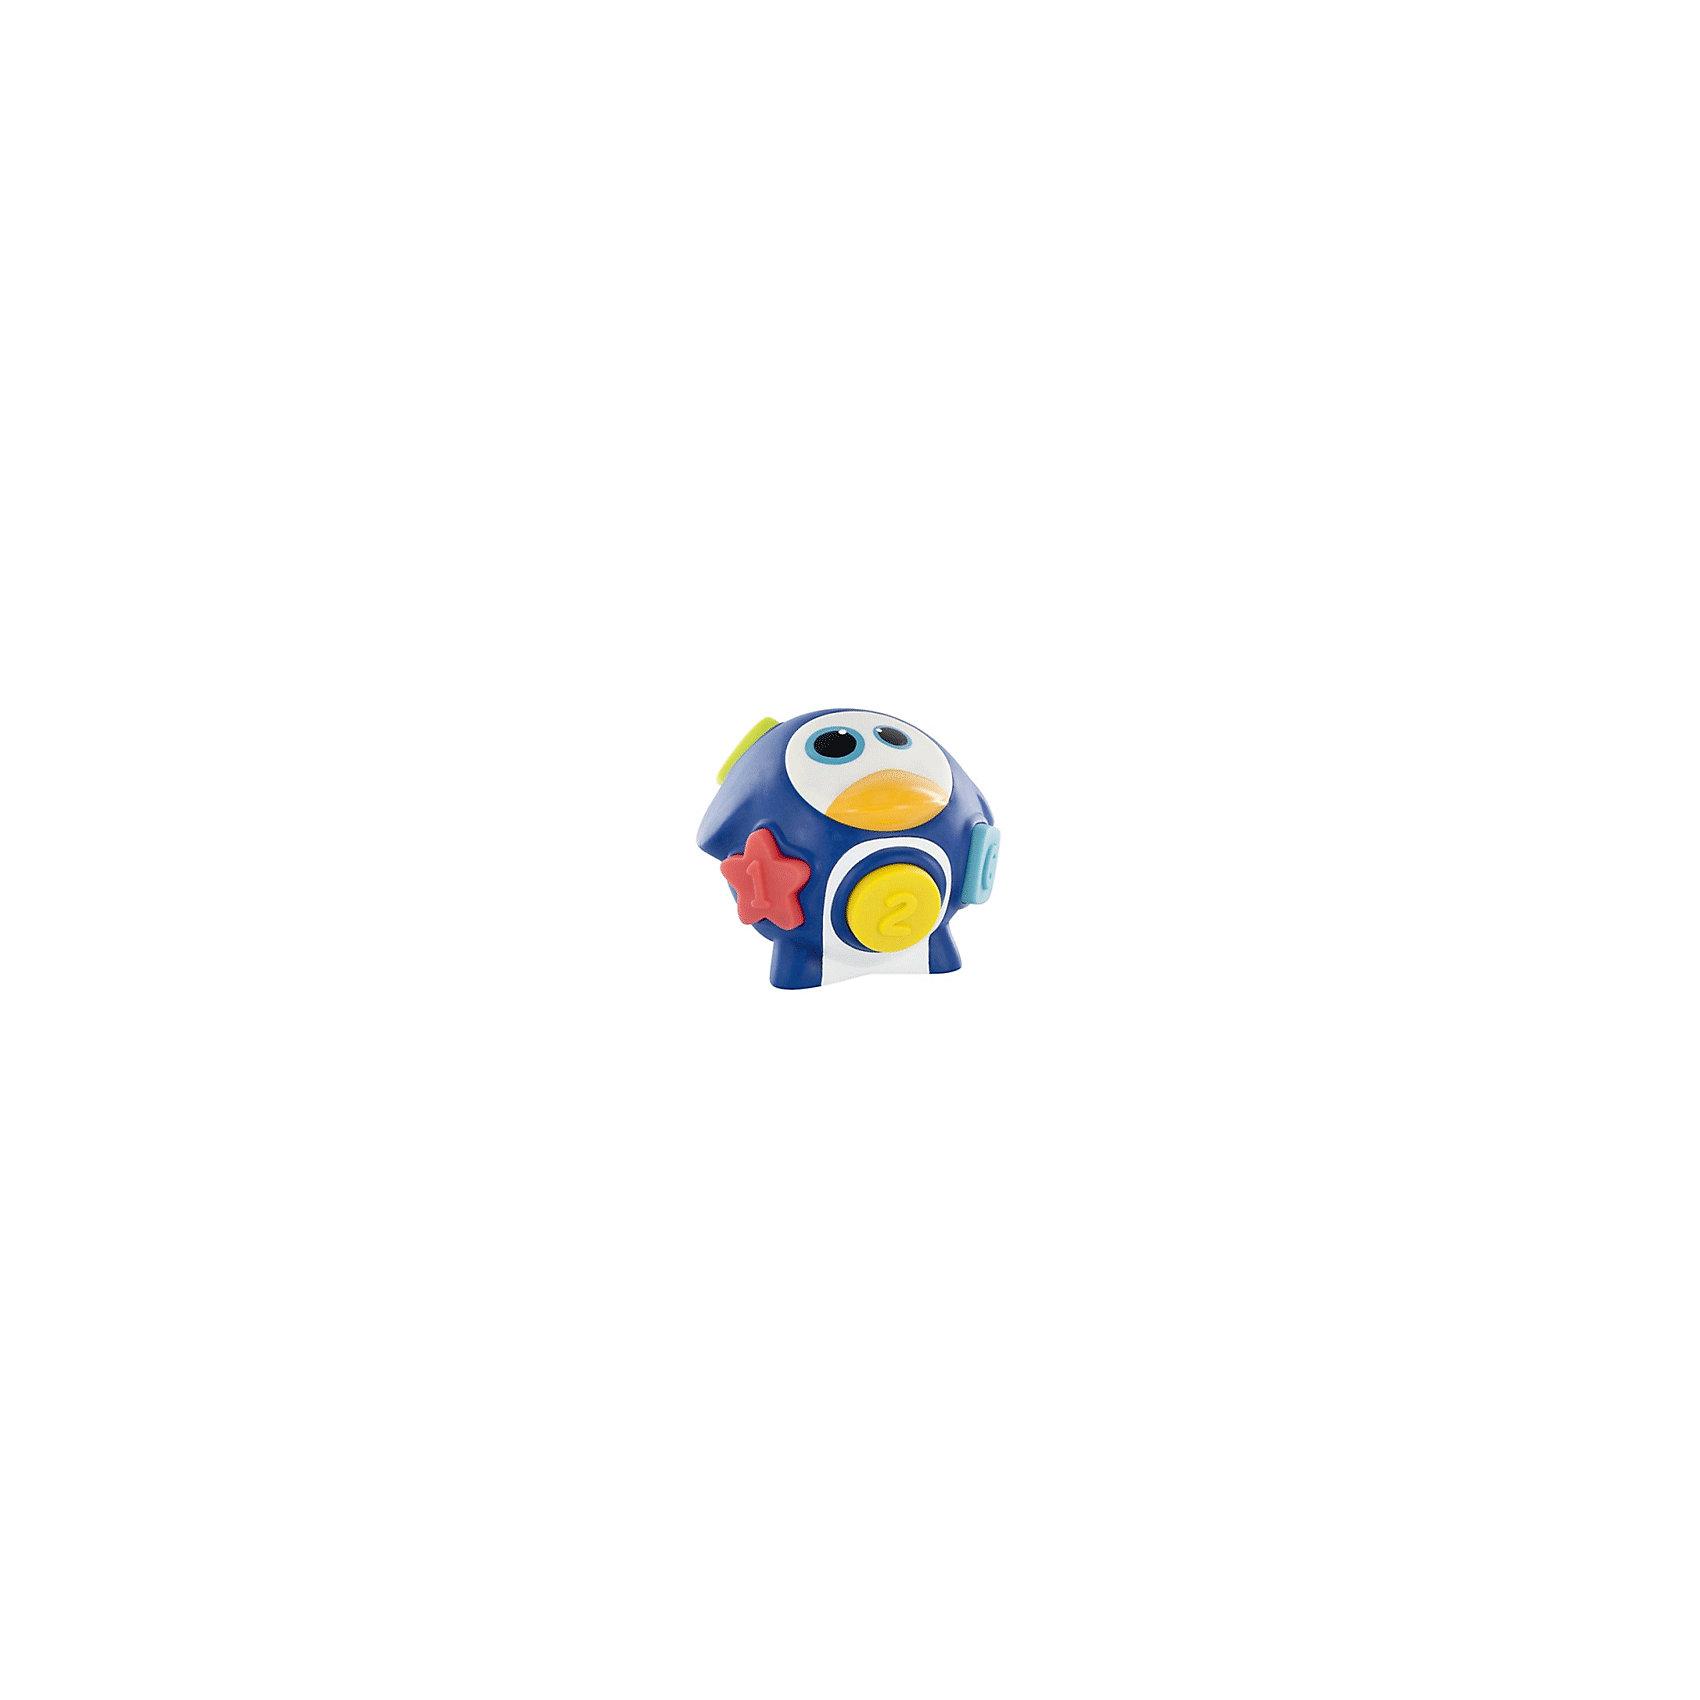 Babymoov Развивающая игрушка-сортер «Пингвин»  А104912, Babymoov babymoov